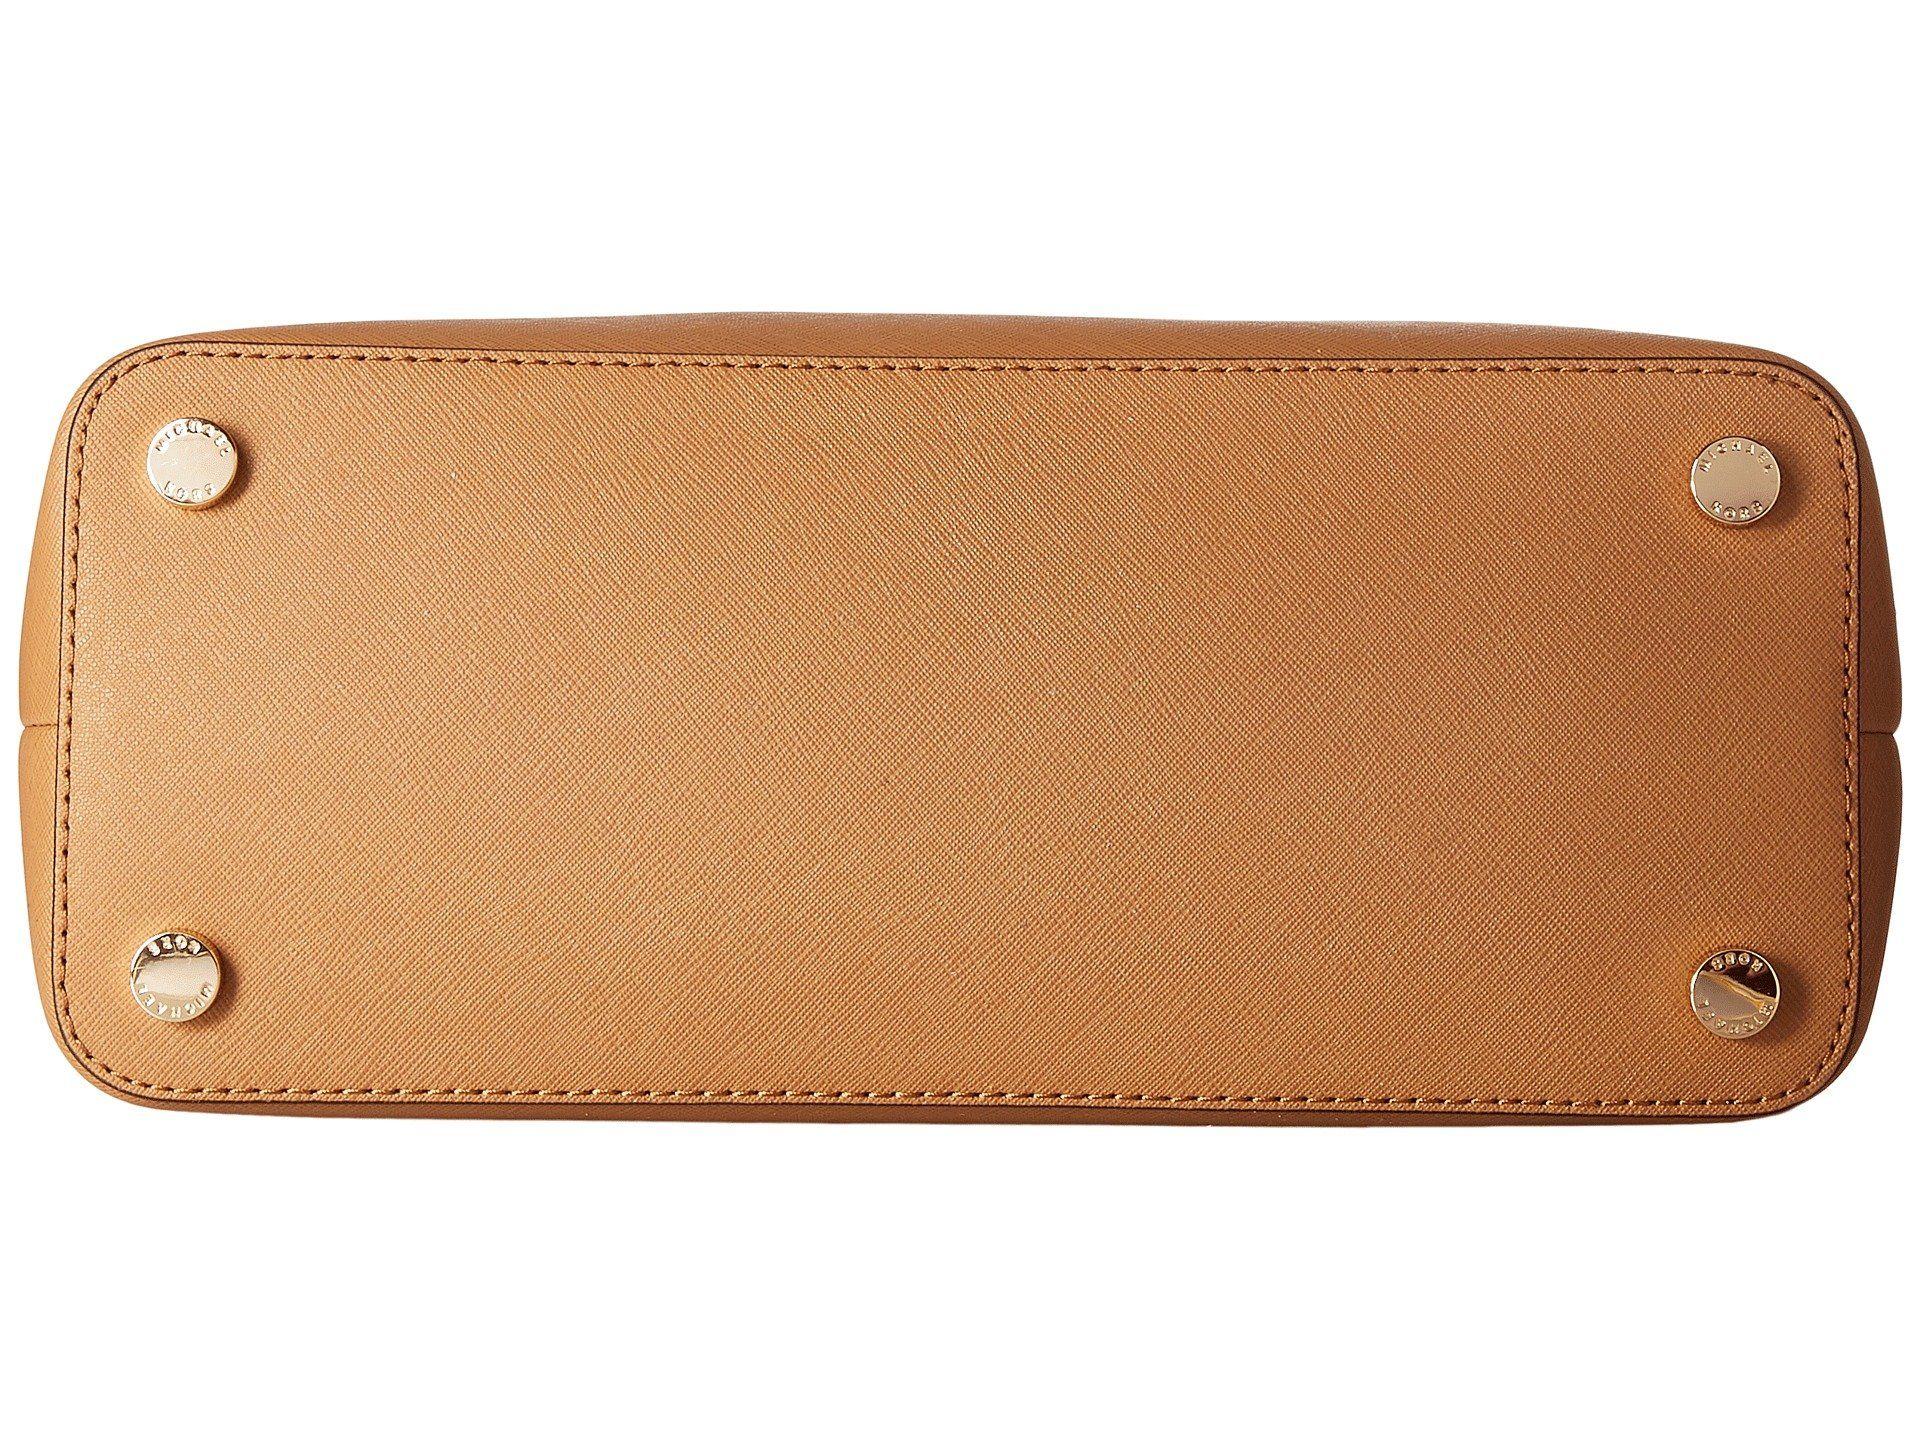 fc07a74de74f MICHAEL Michael Kors Morgan Large Leather Tote Acorn Brown ** Visit the  image link more details. (This is an affiliate link) #MichaelKorsHandbags